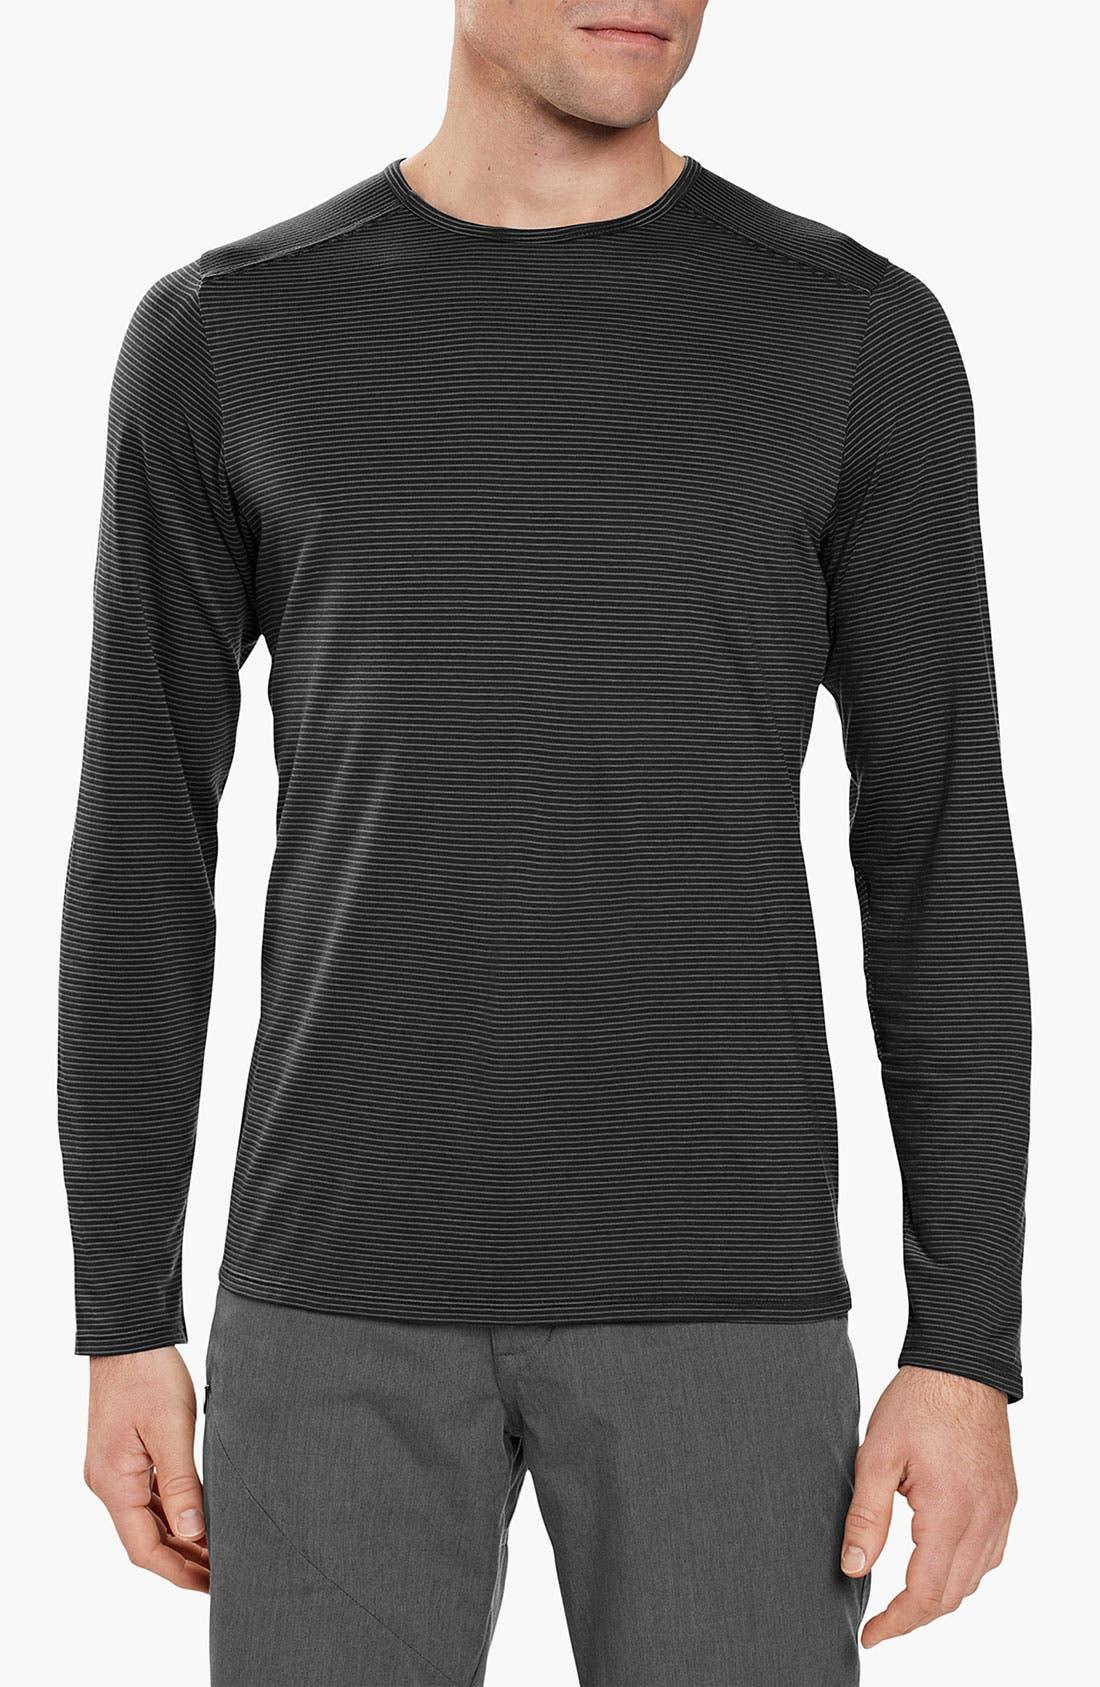 Alternate Image 1 Selected - Nau 'Ayre' Long Sleeve T-Shirt